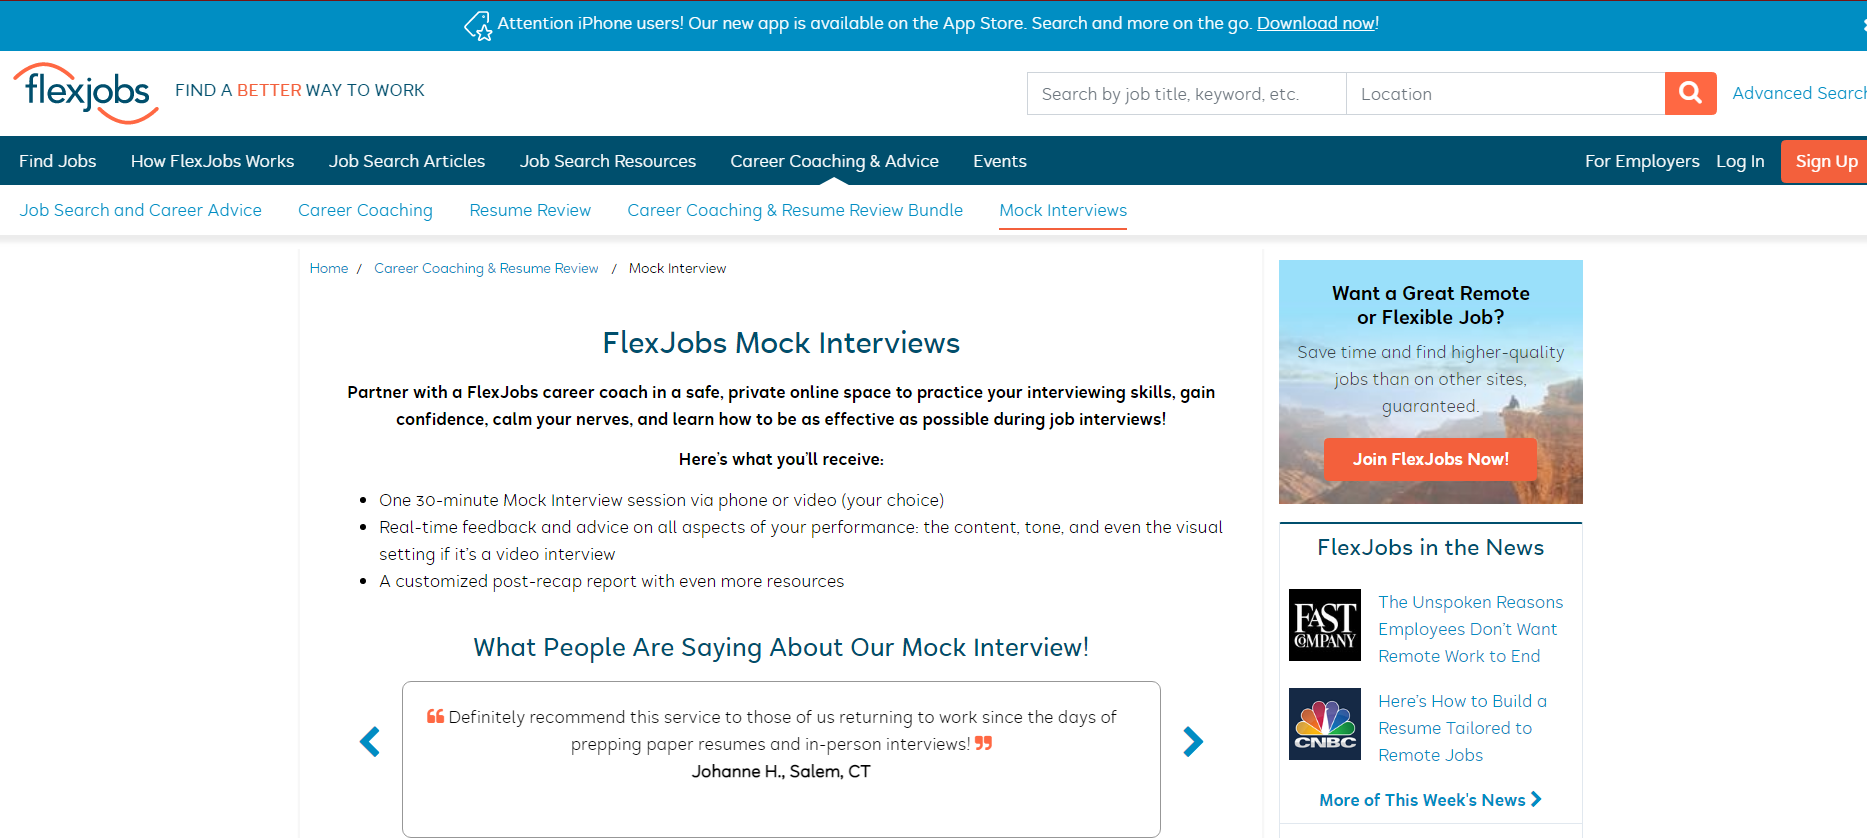 flexjobs mock interviews